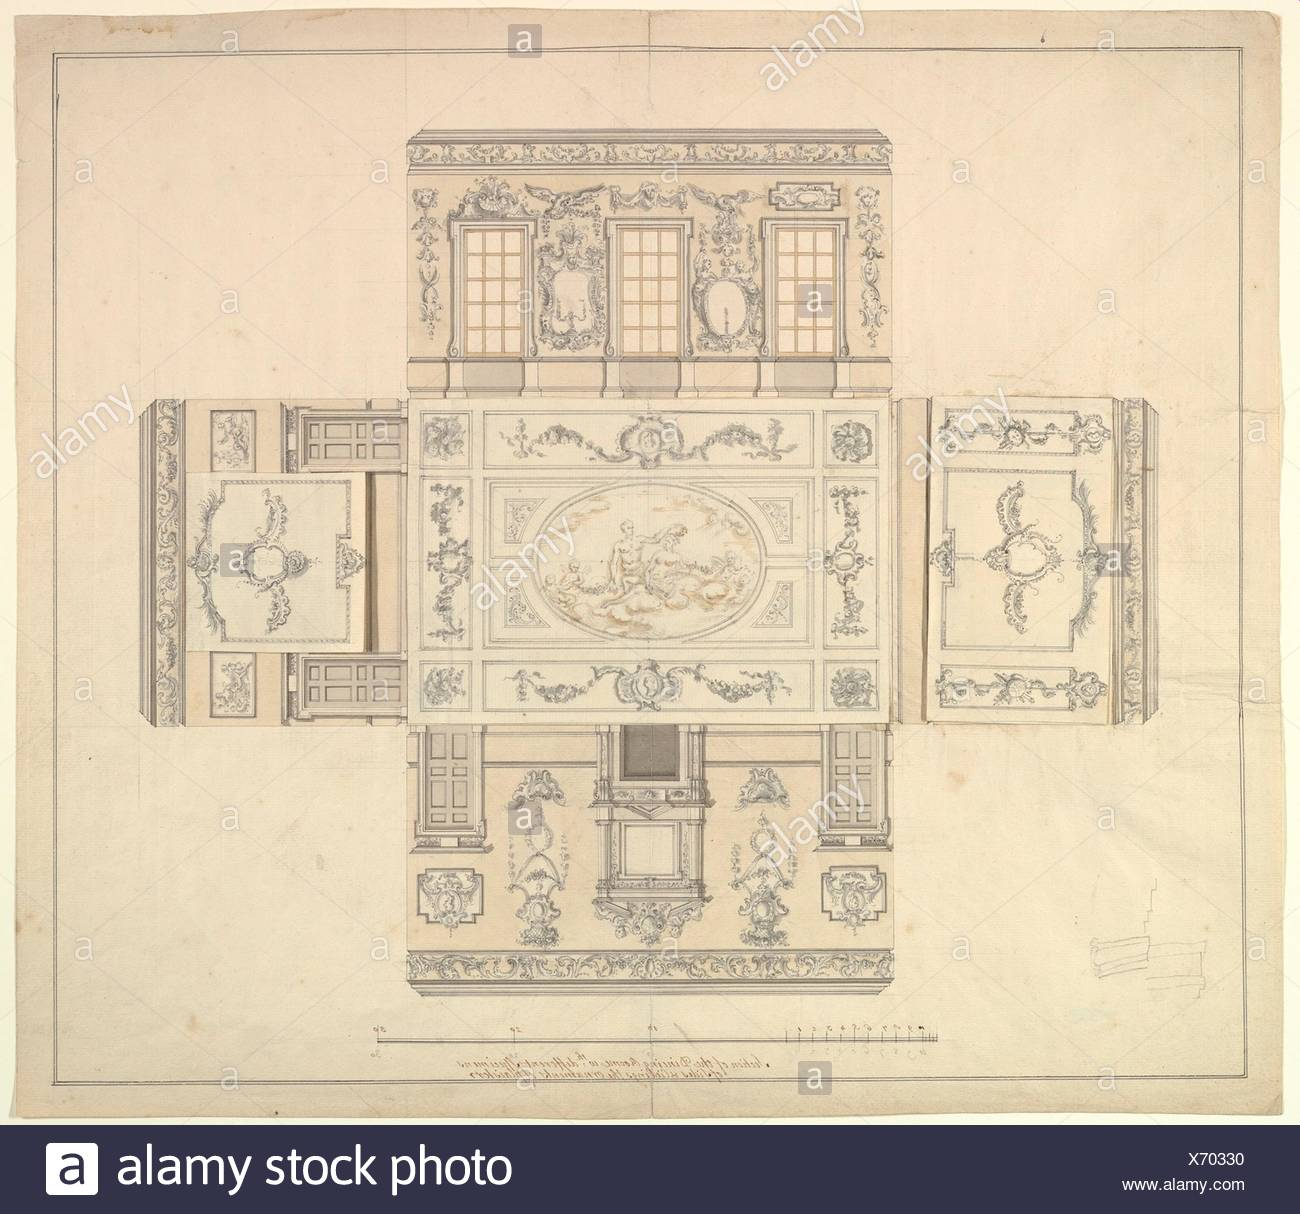 Dining Room at Kirtlington Park, Oxfordshire. Artist: John Sanderson (British, active from 1730, died 1774); Date: ca. 1747-48; Medium: Pen, brown - Stock Image